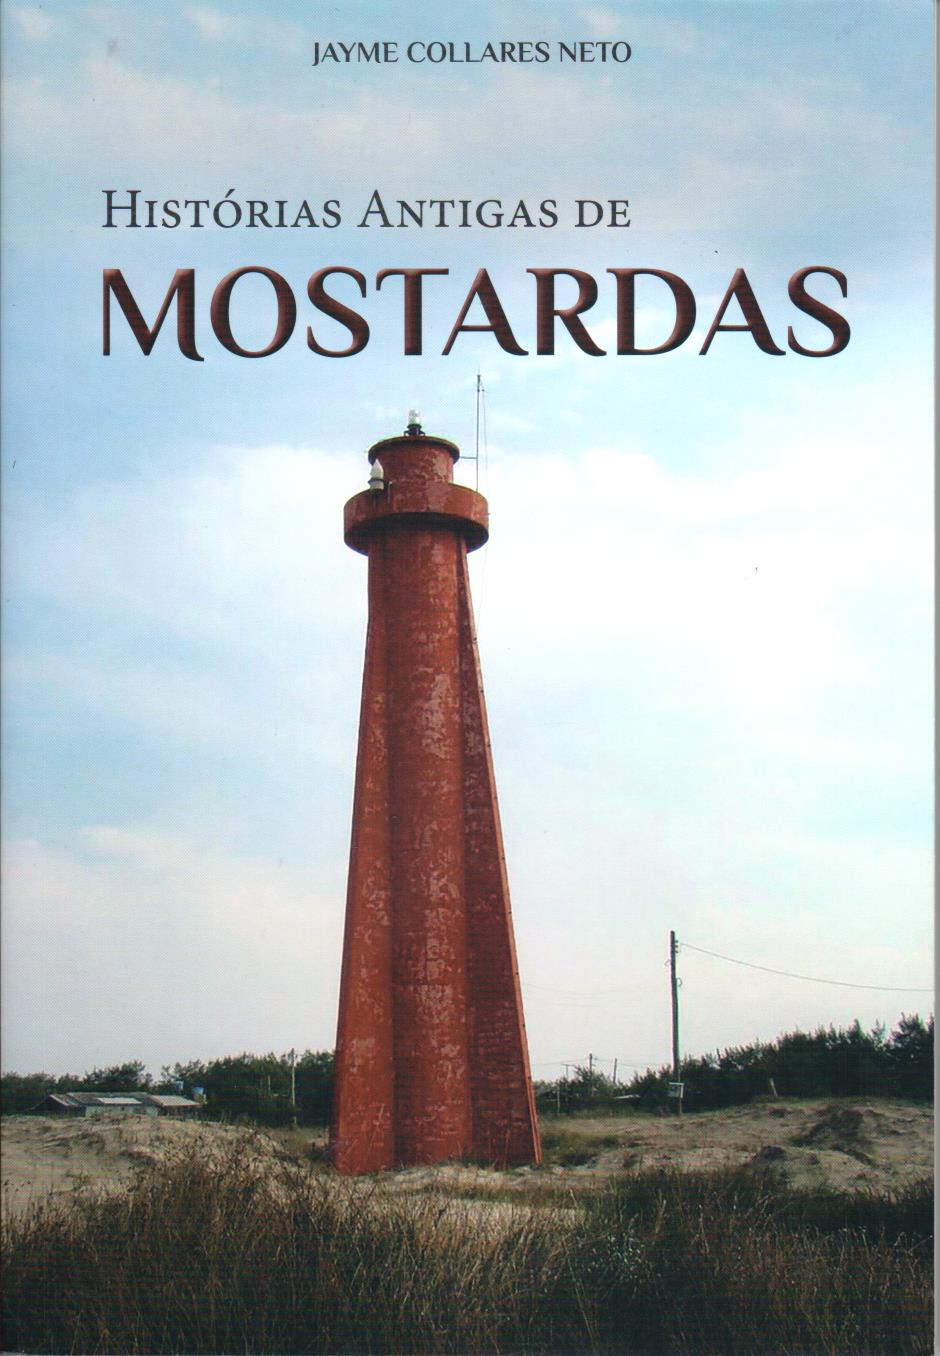 HISTORIAS ANTIGAS DE MOSTARDAS